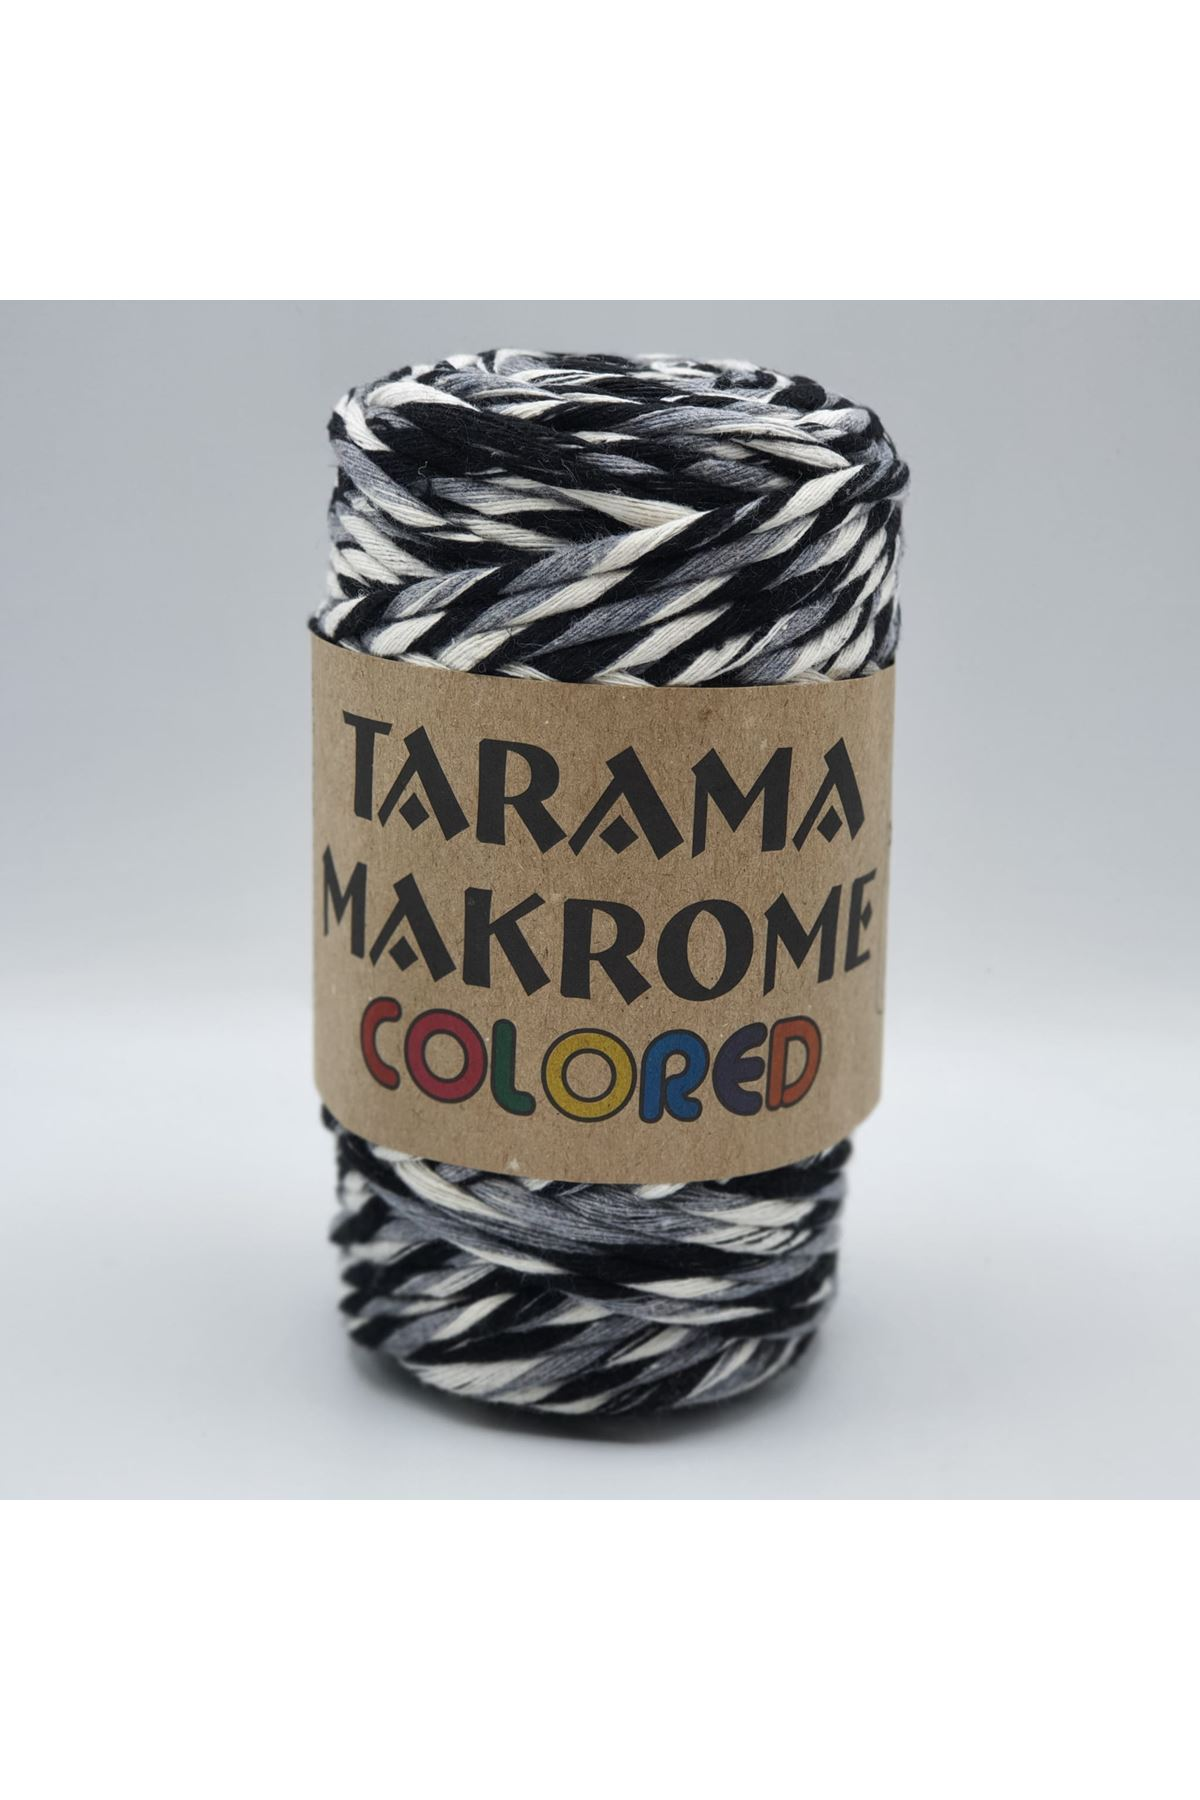 Tarama Makrome Colored 5 mm - 06